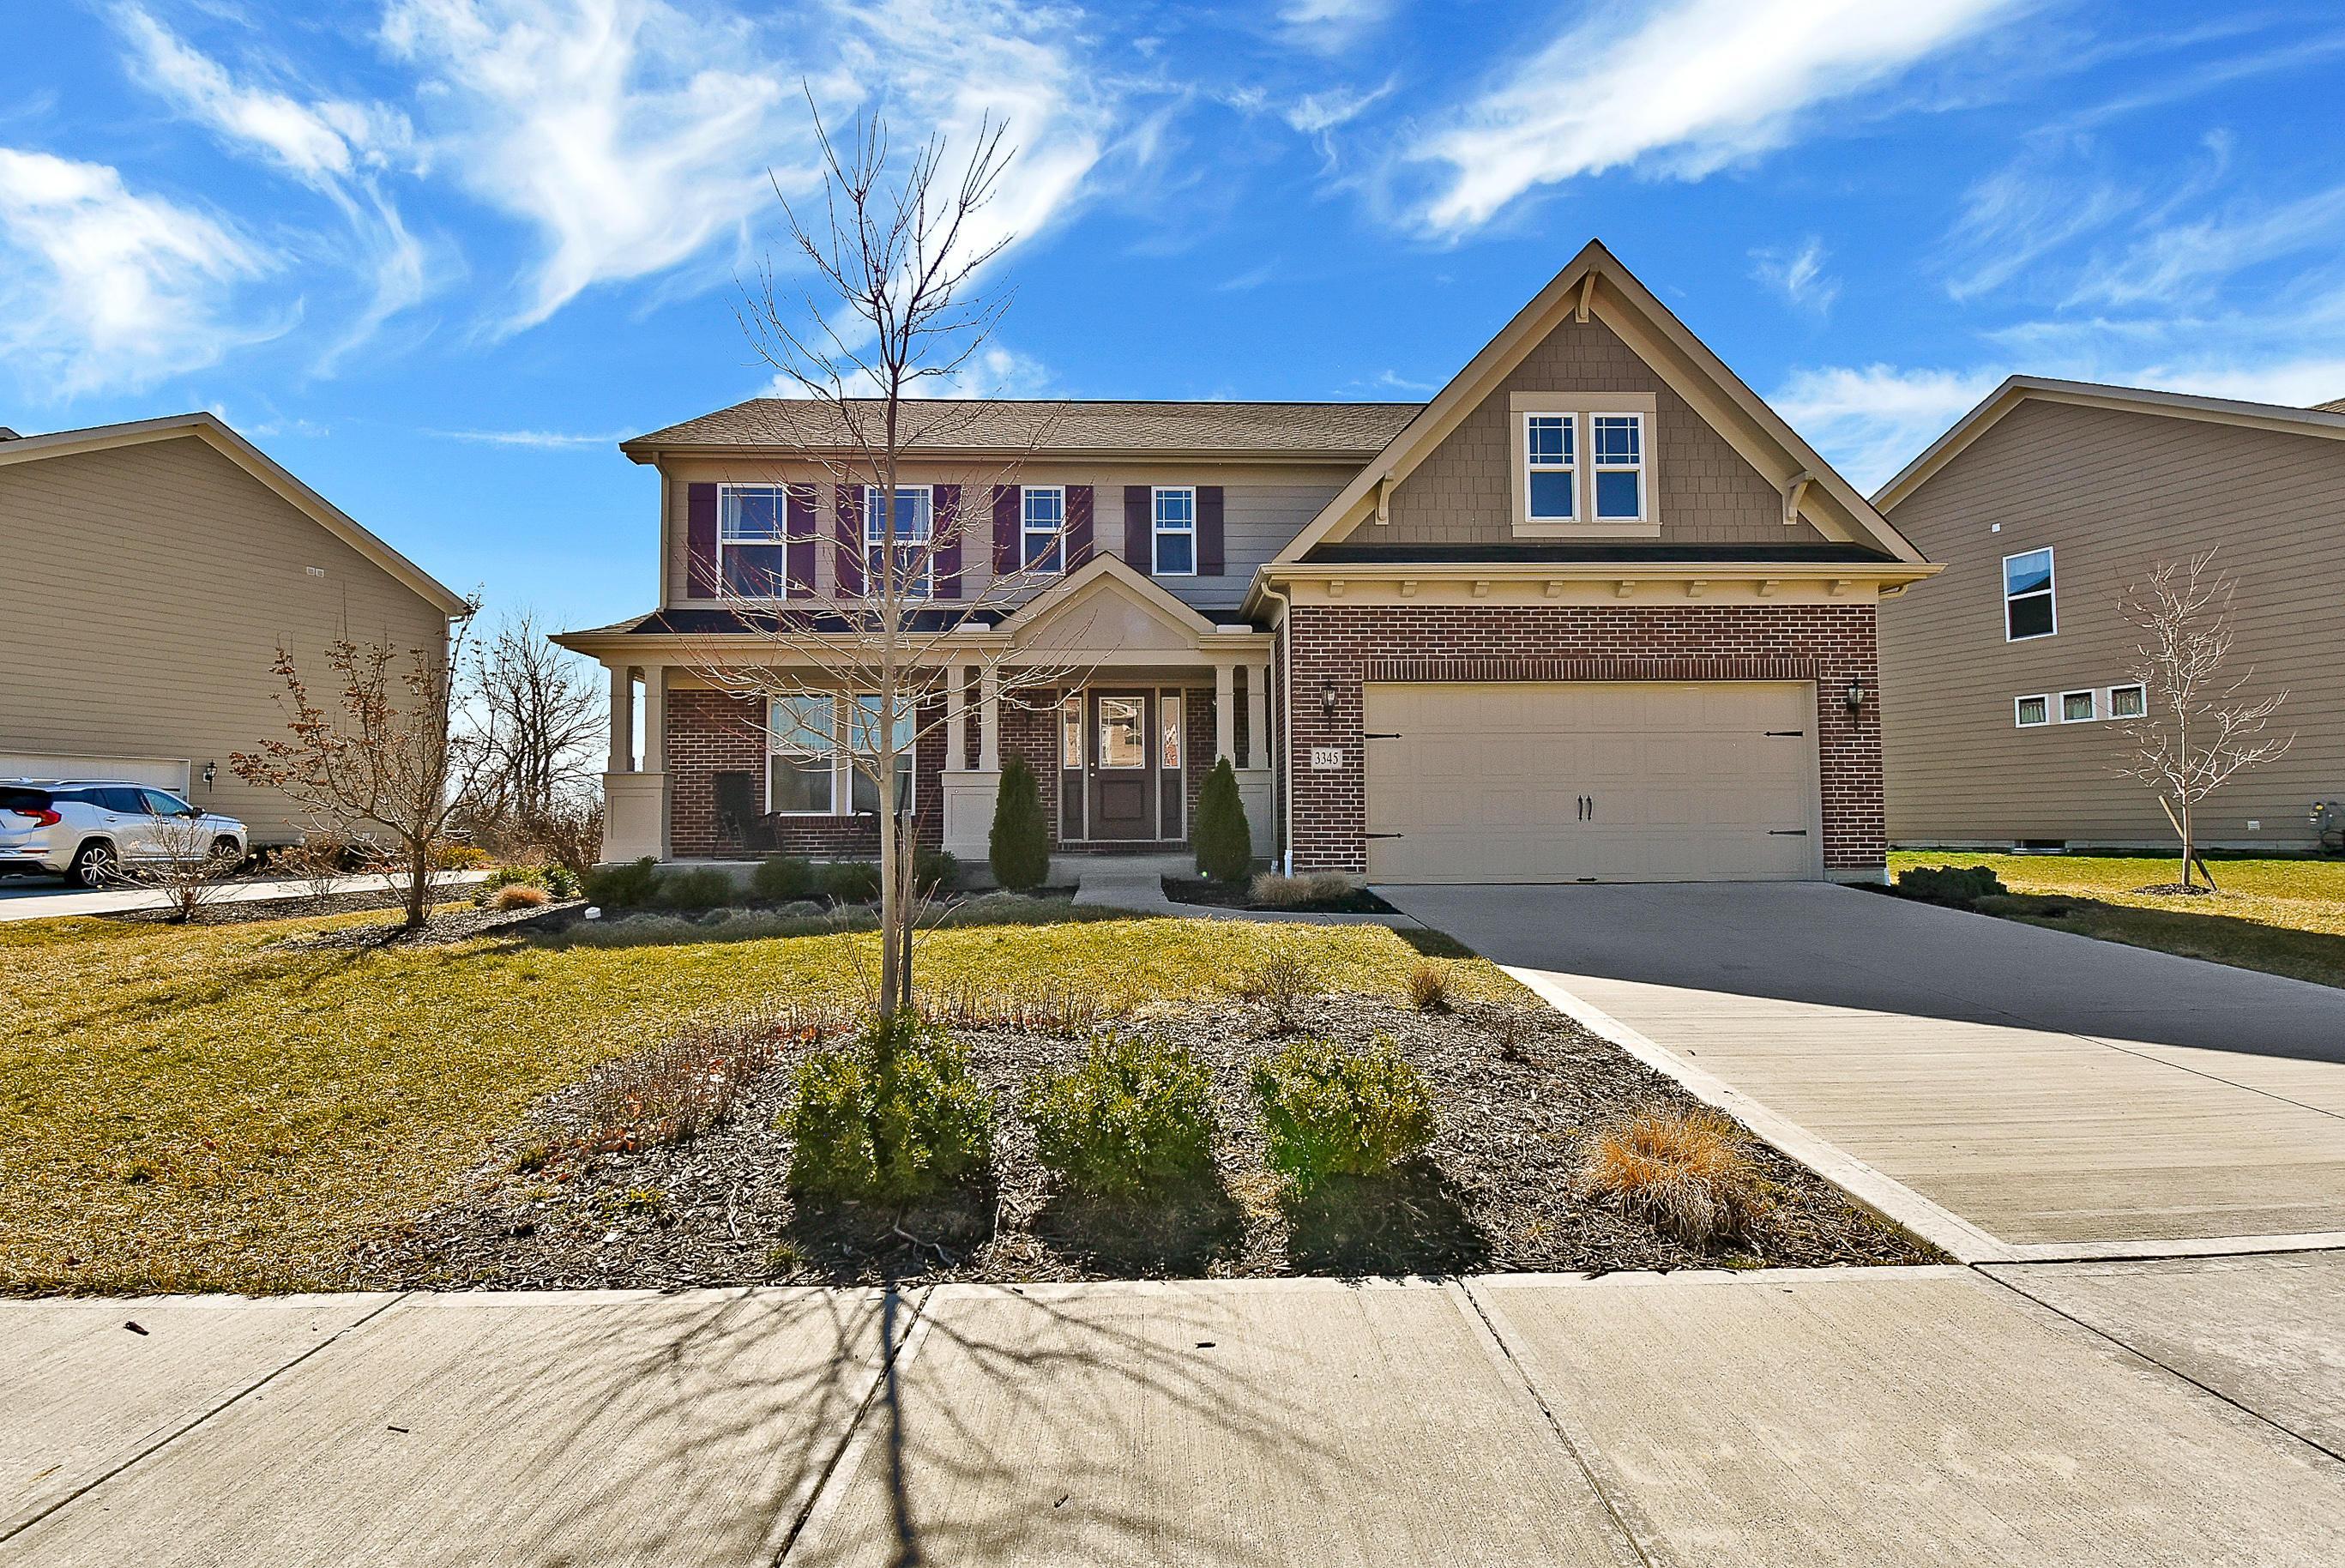 3345 Woodland Drive, Hilliard, Ohio 43026, 4 Bedrooms Bedrooms, ,4 BathroomsBathrooms,Residential,For Sale,Woodland,220017422